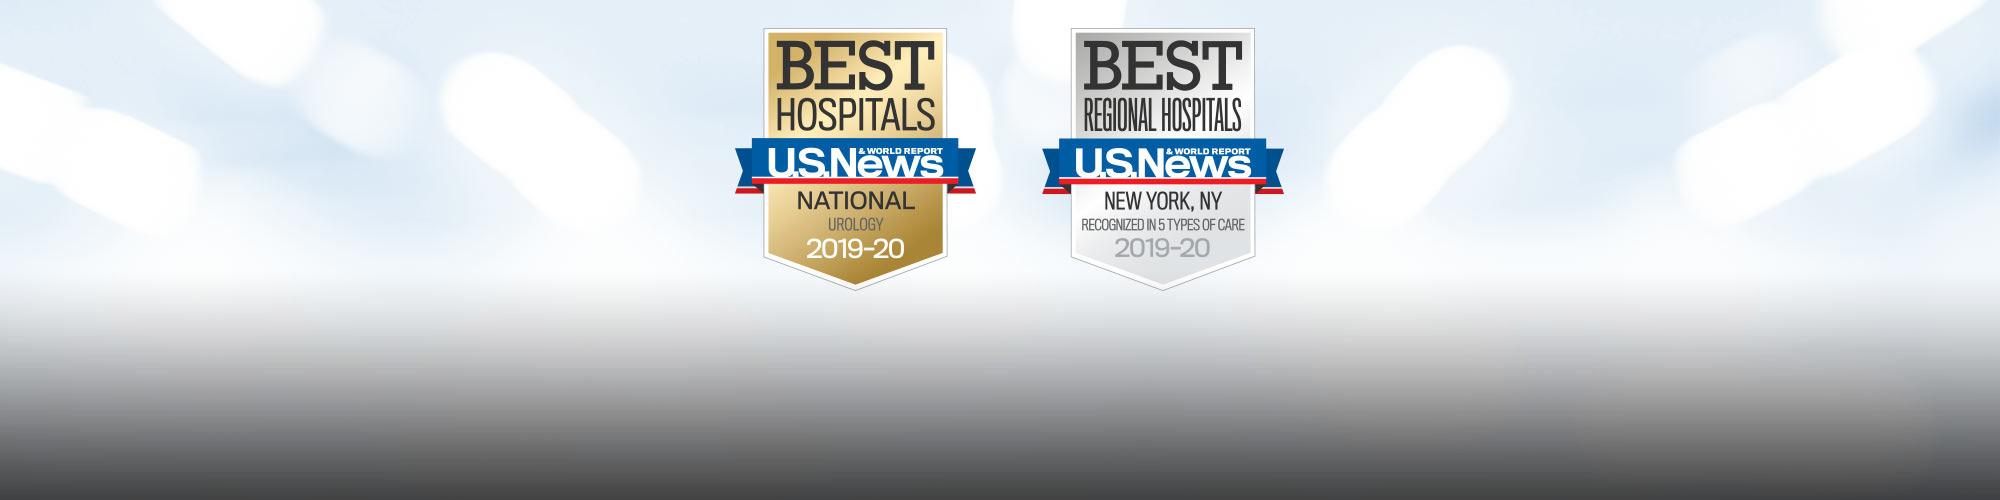 South Nassau Communities Hospital, Long Island Medical Center